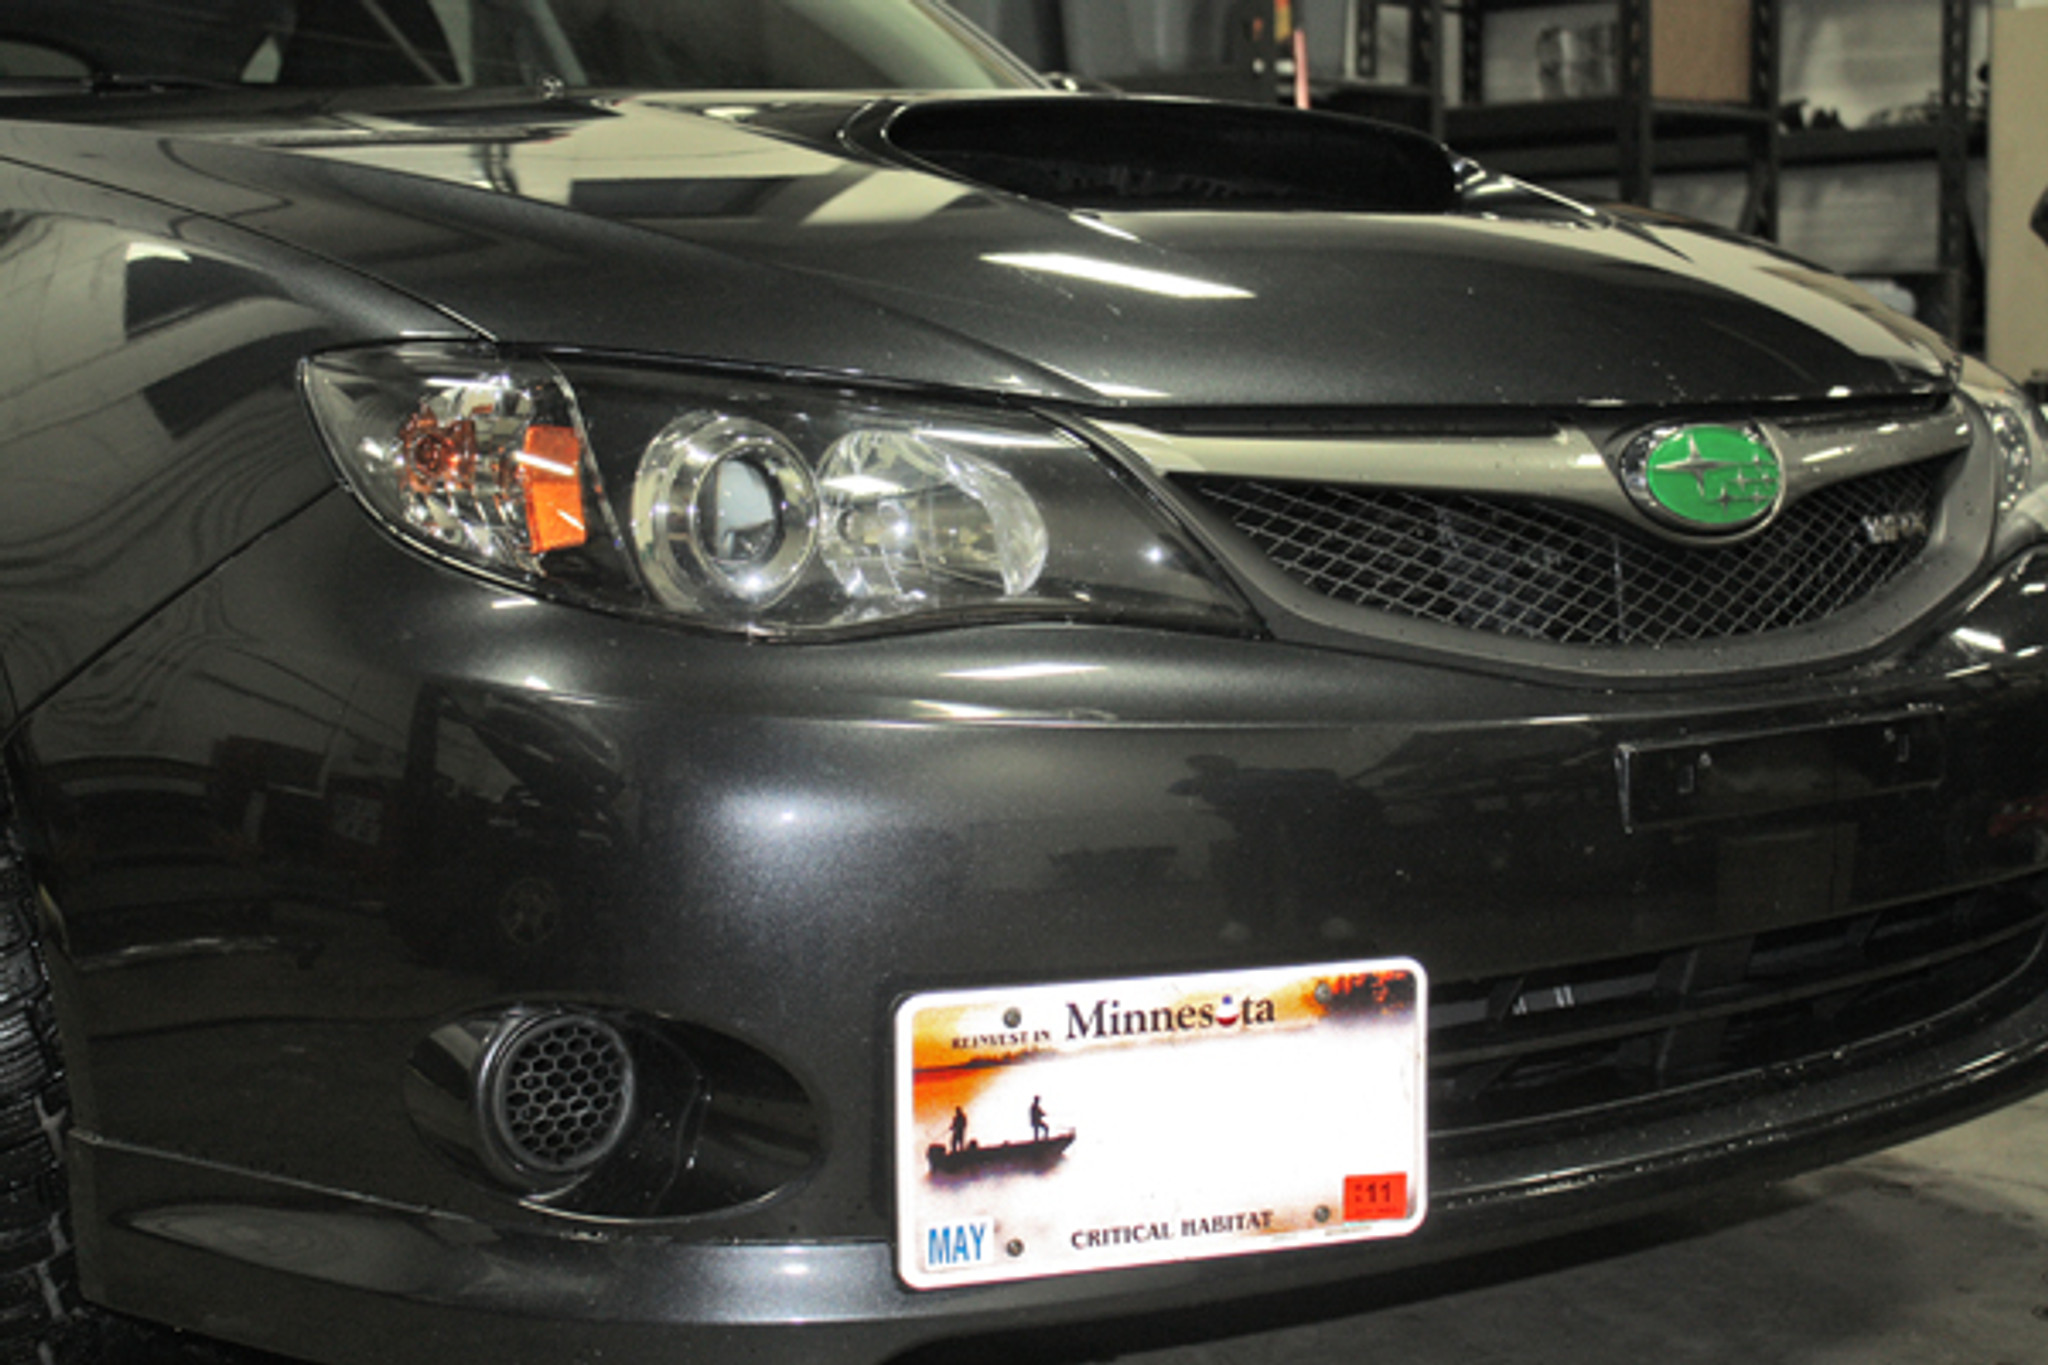 Multi Angle Tow Hook Mount License Plate Bracket For Subaru STI 08-14